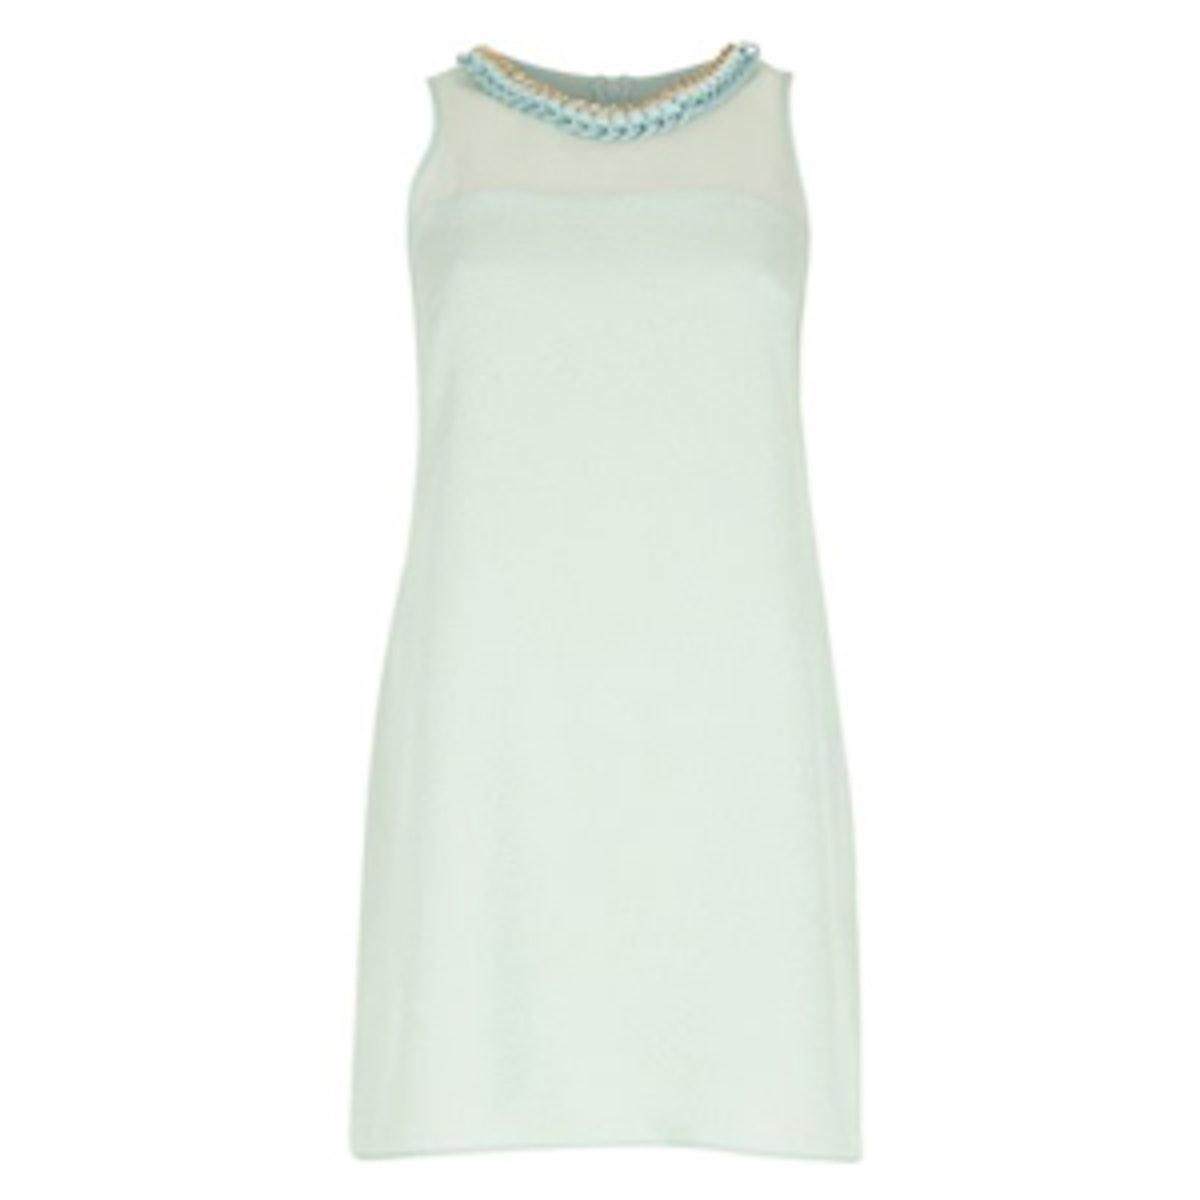 Green Sleeveless Embellished Shift Dress